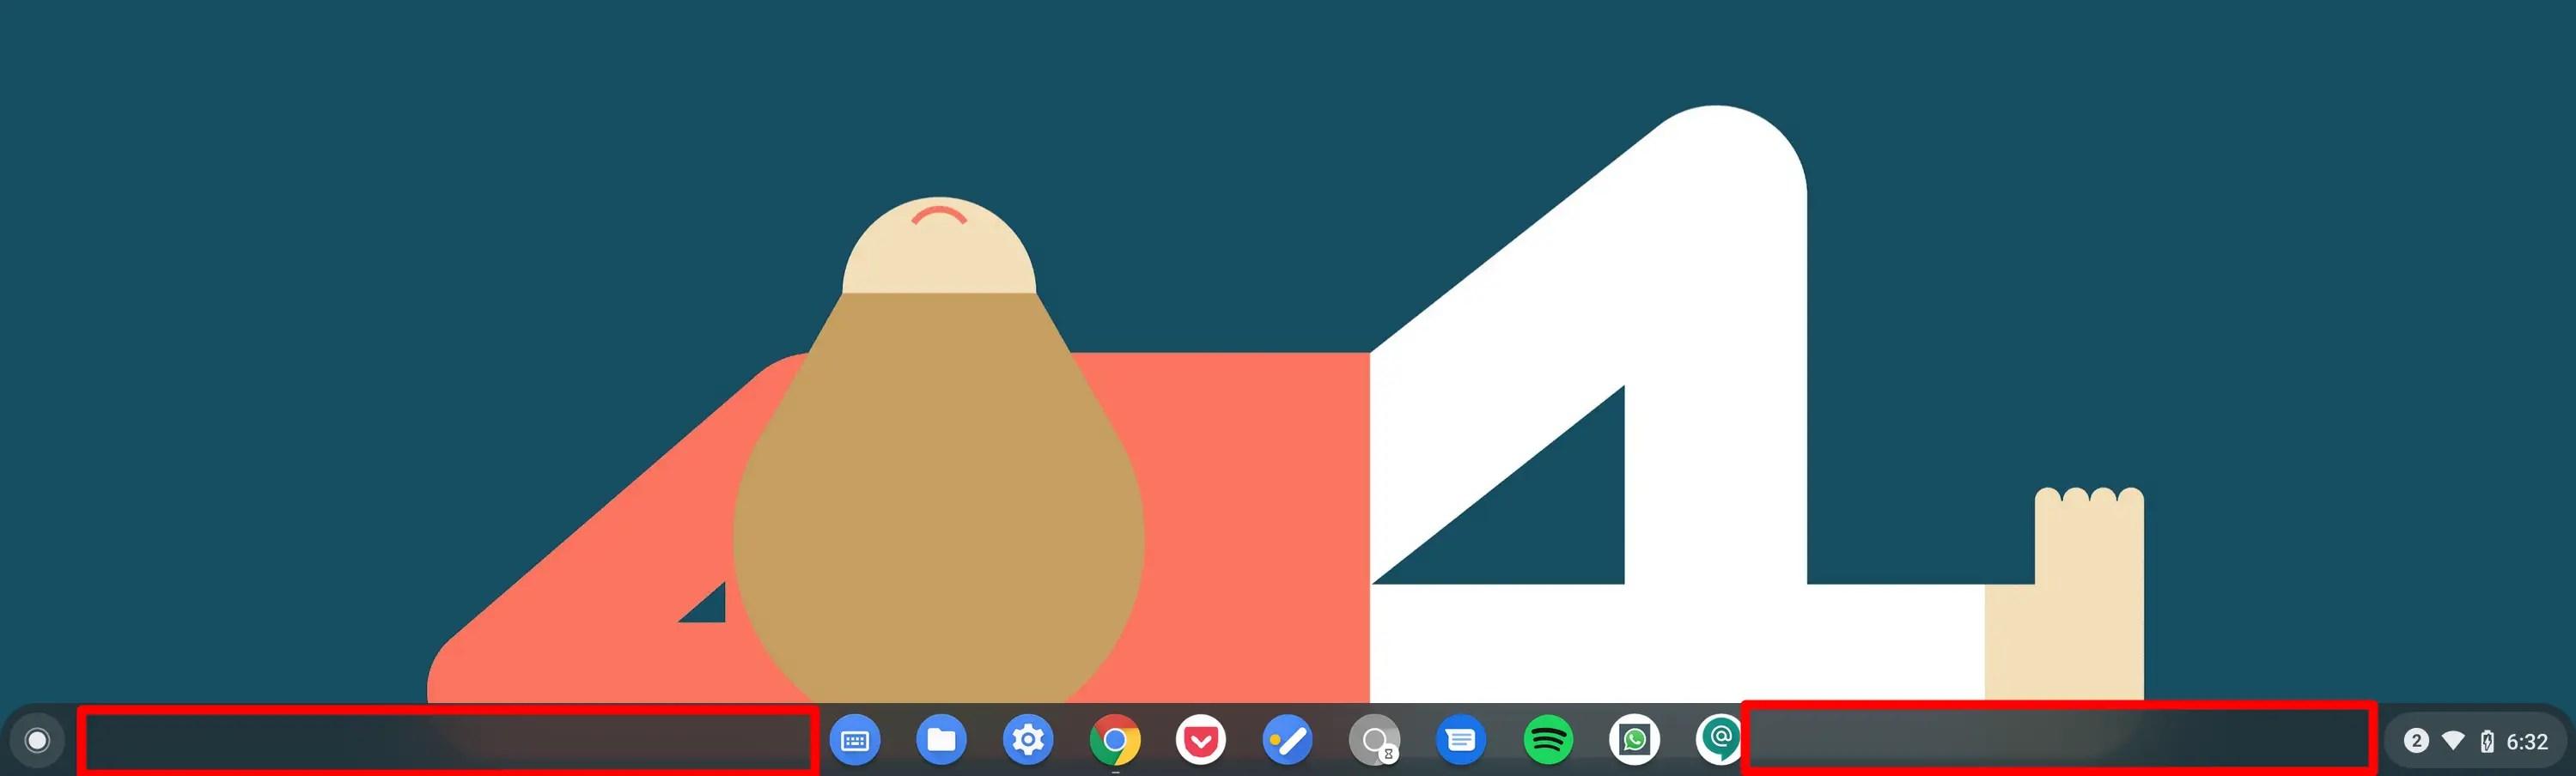 Chromebook Shelf